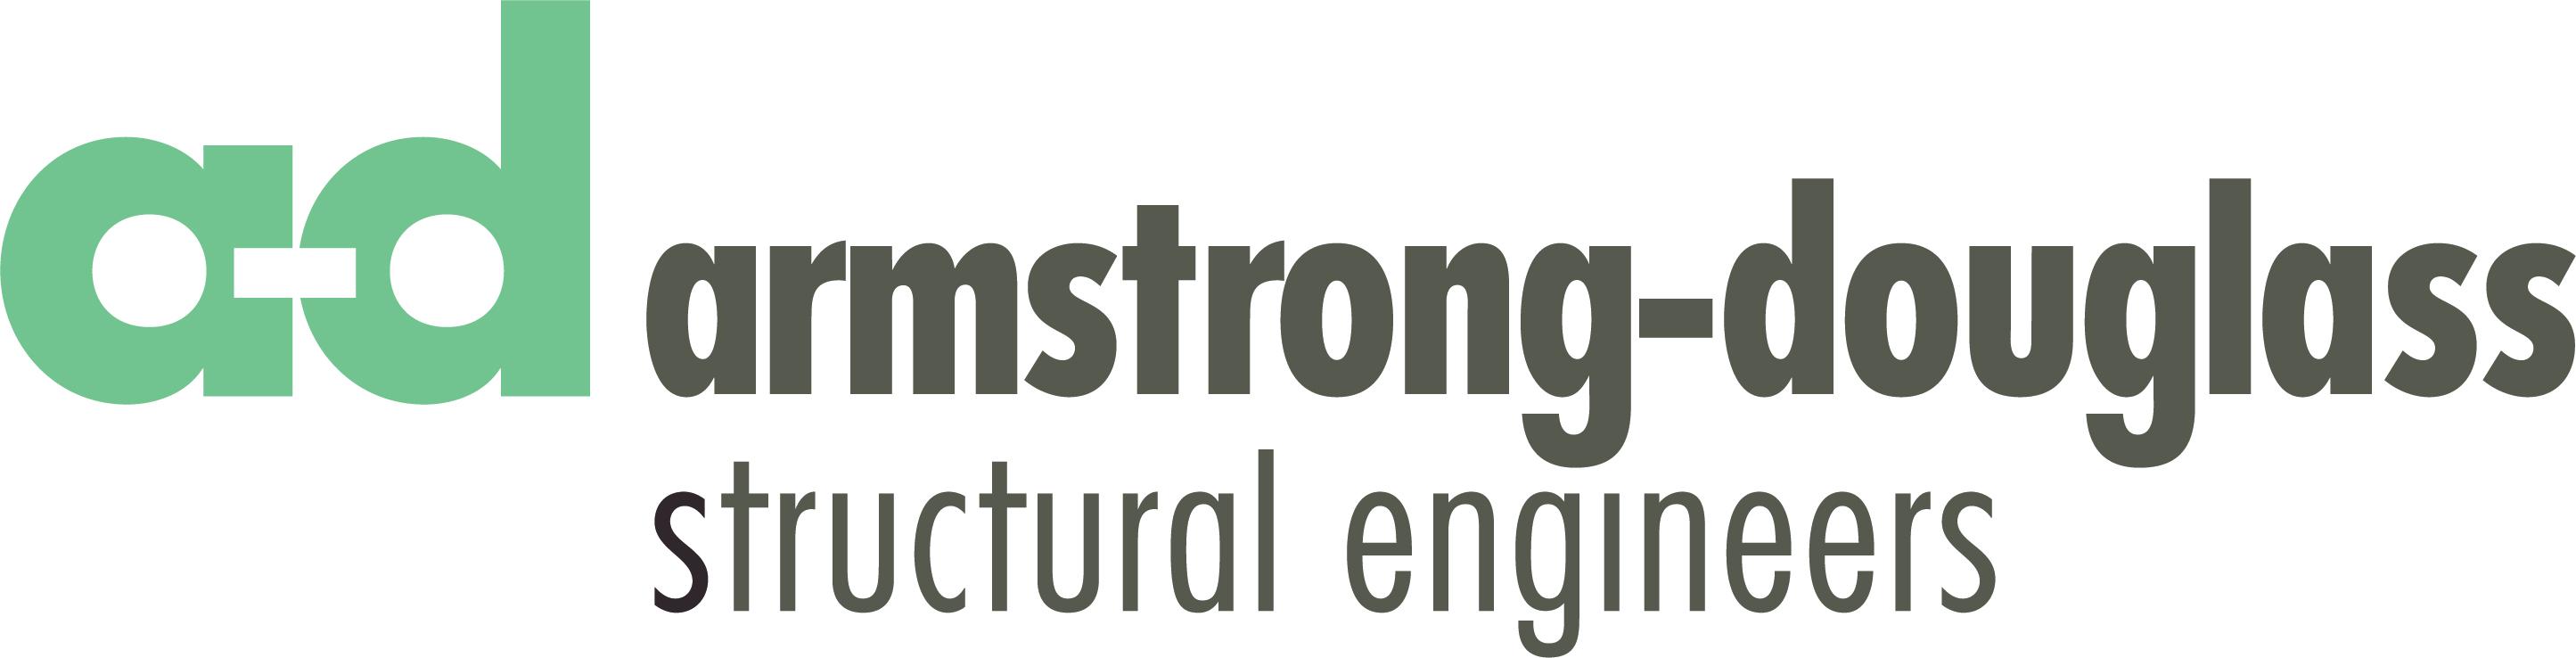 RETROSPECT - Armstrong-Douglass logo